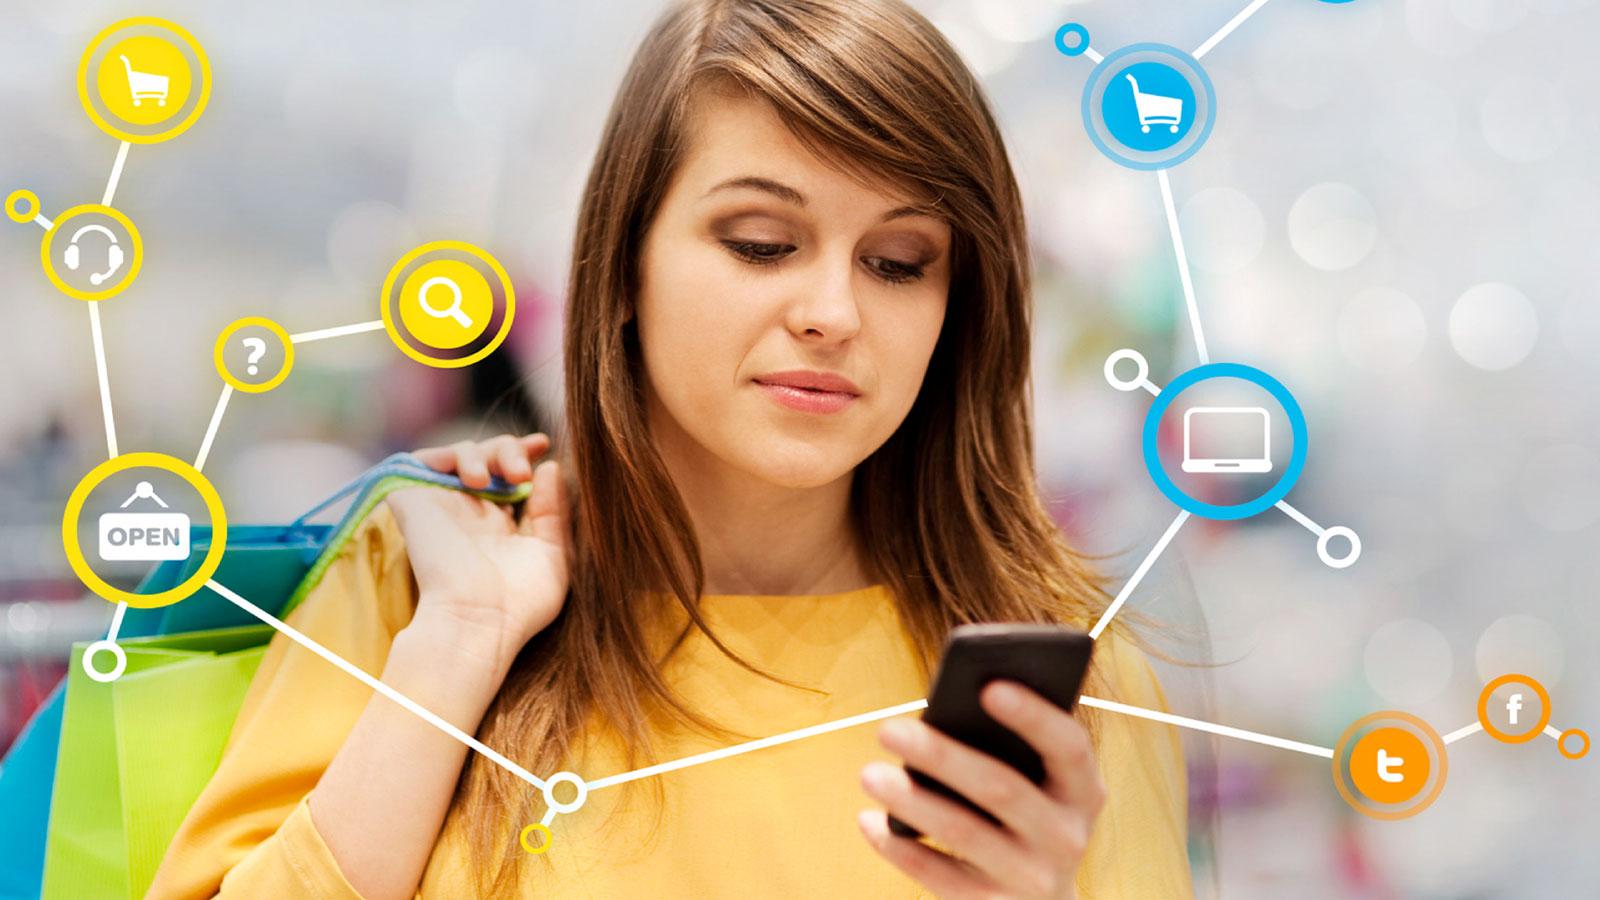 digital consumer engagement for consumer goods